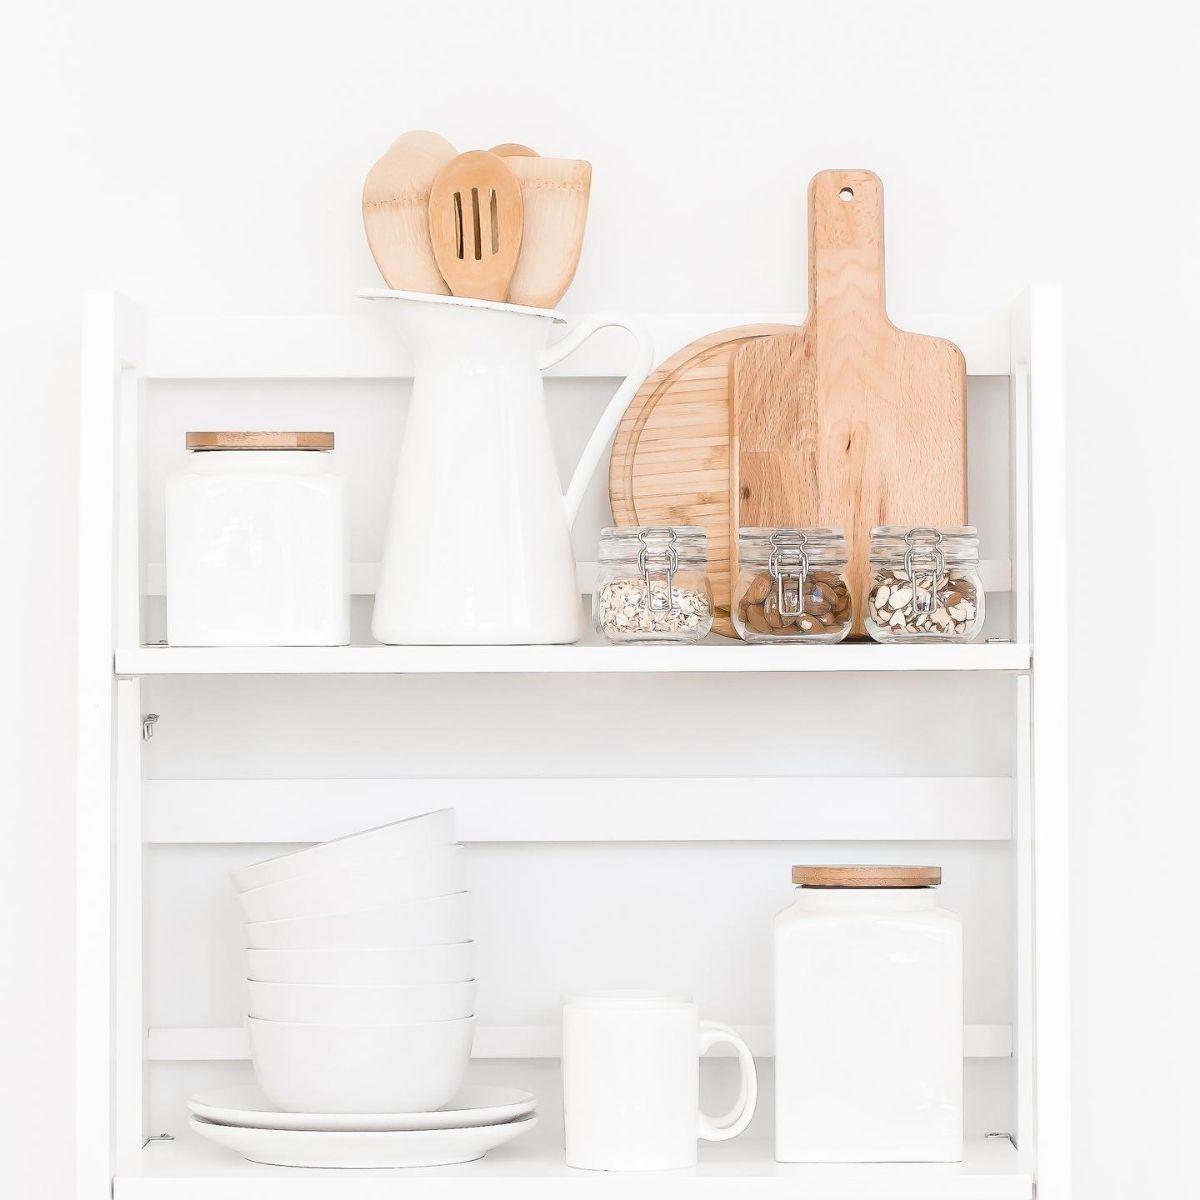 kitchen items organized on a small shelf